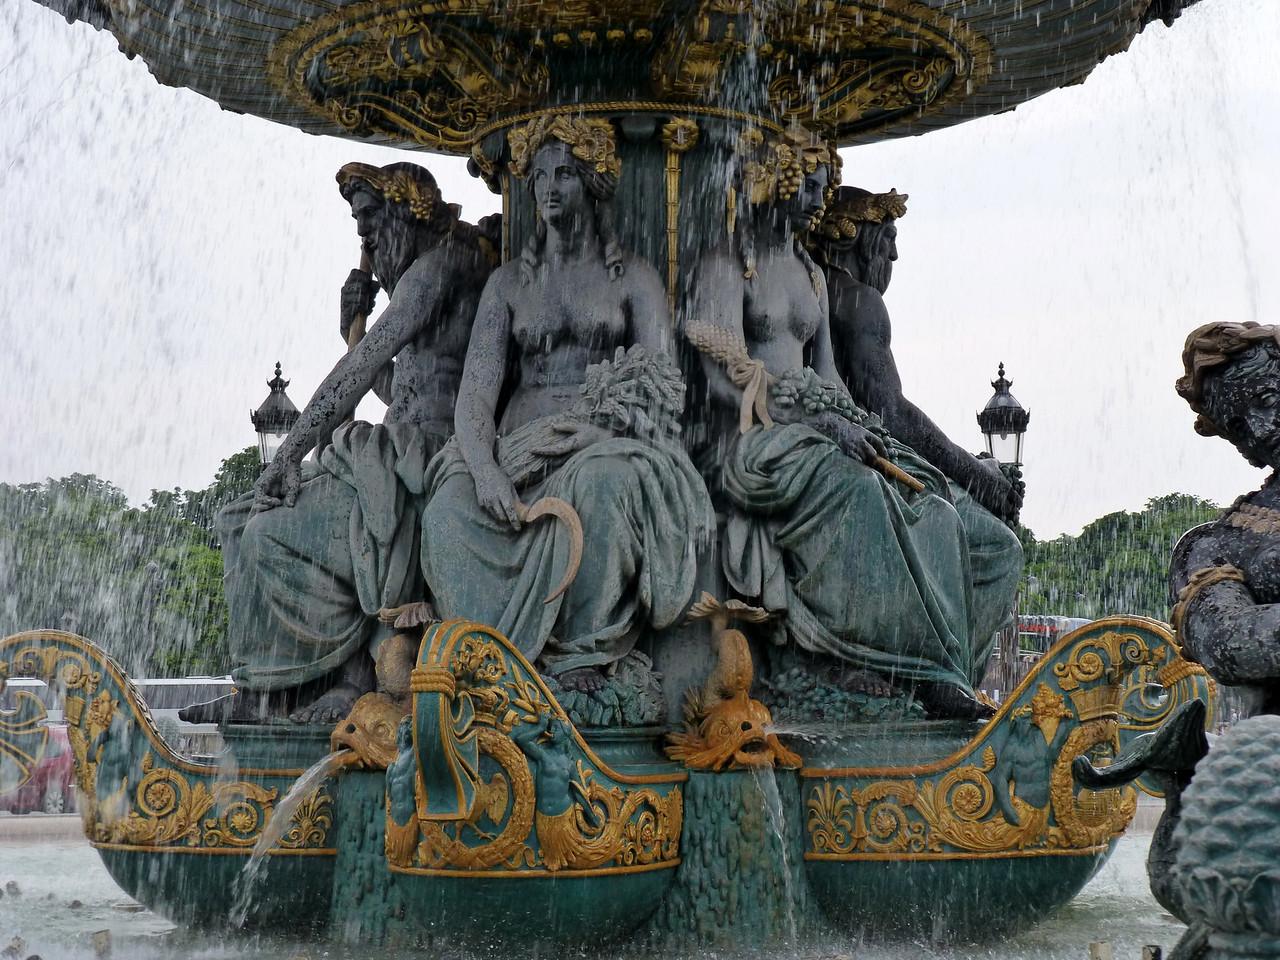 Boobs fountaine at Place de la Concorde